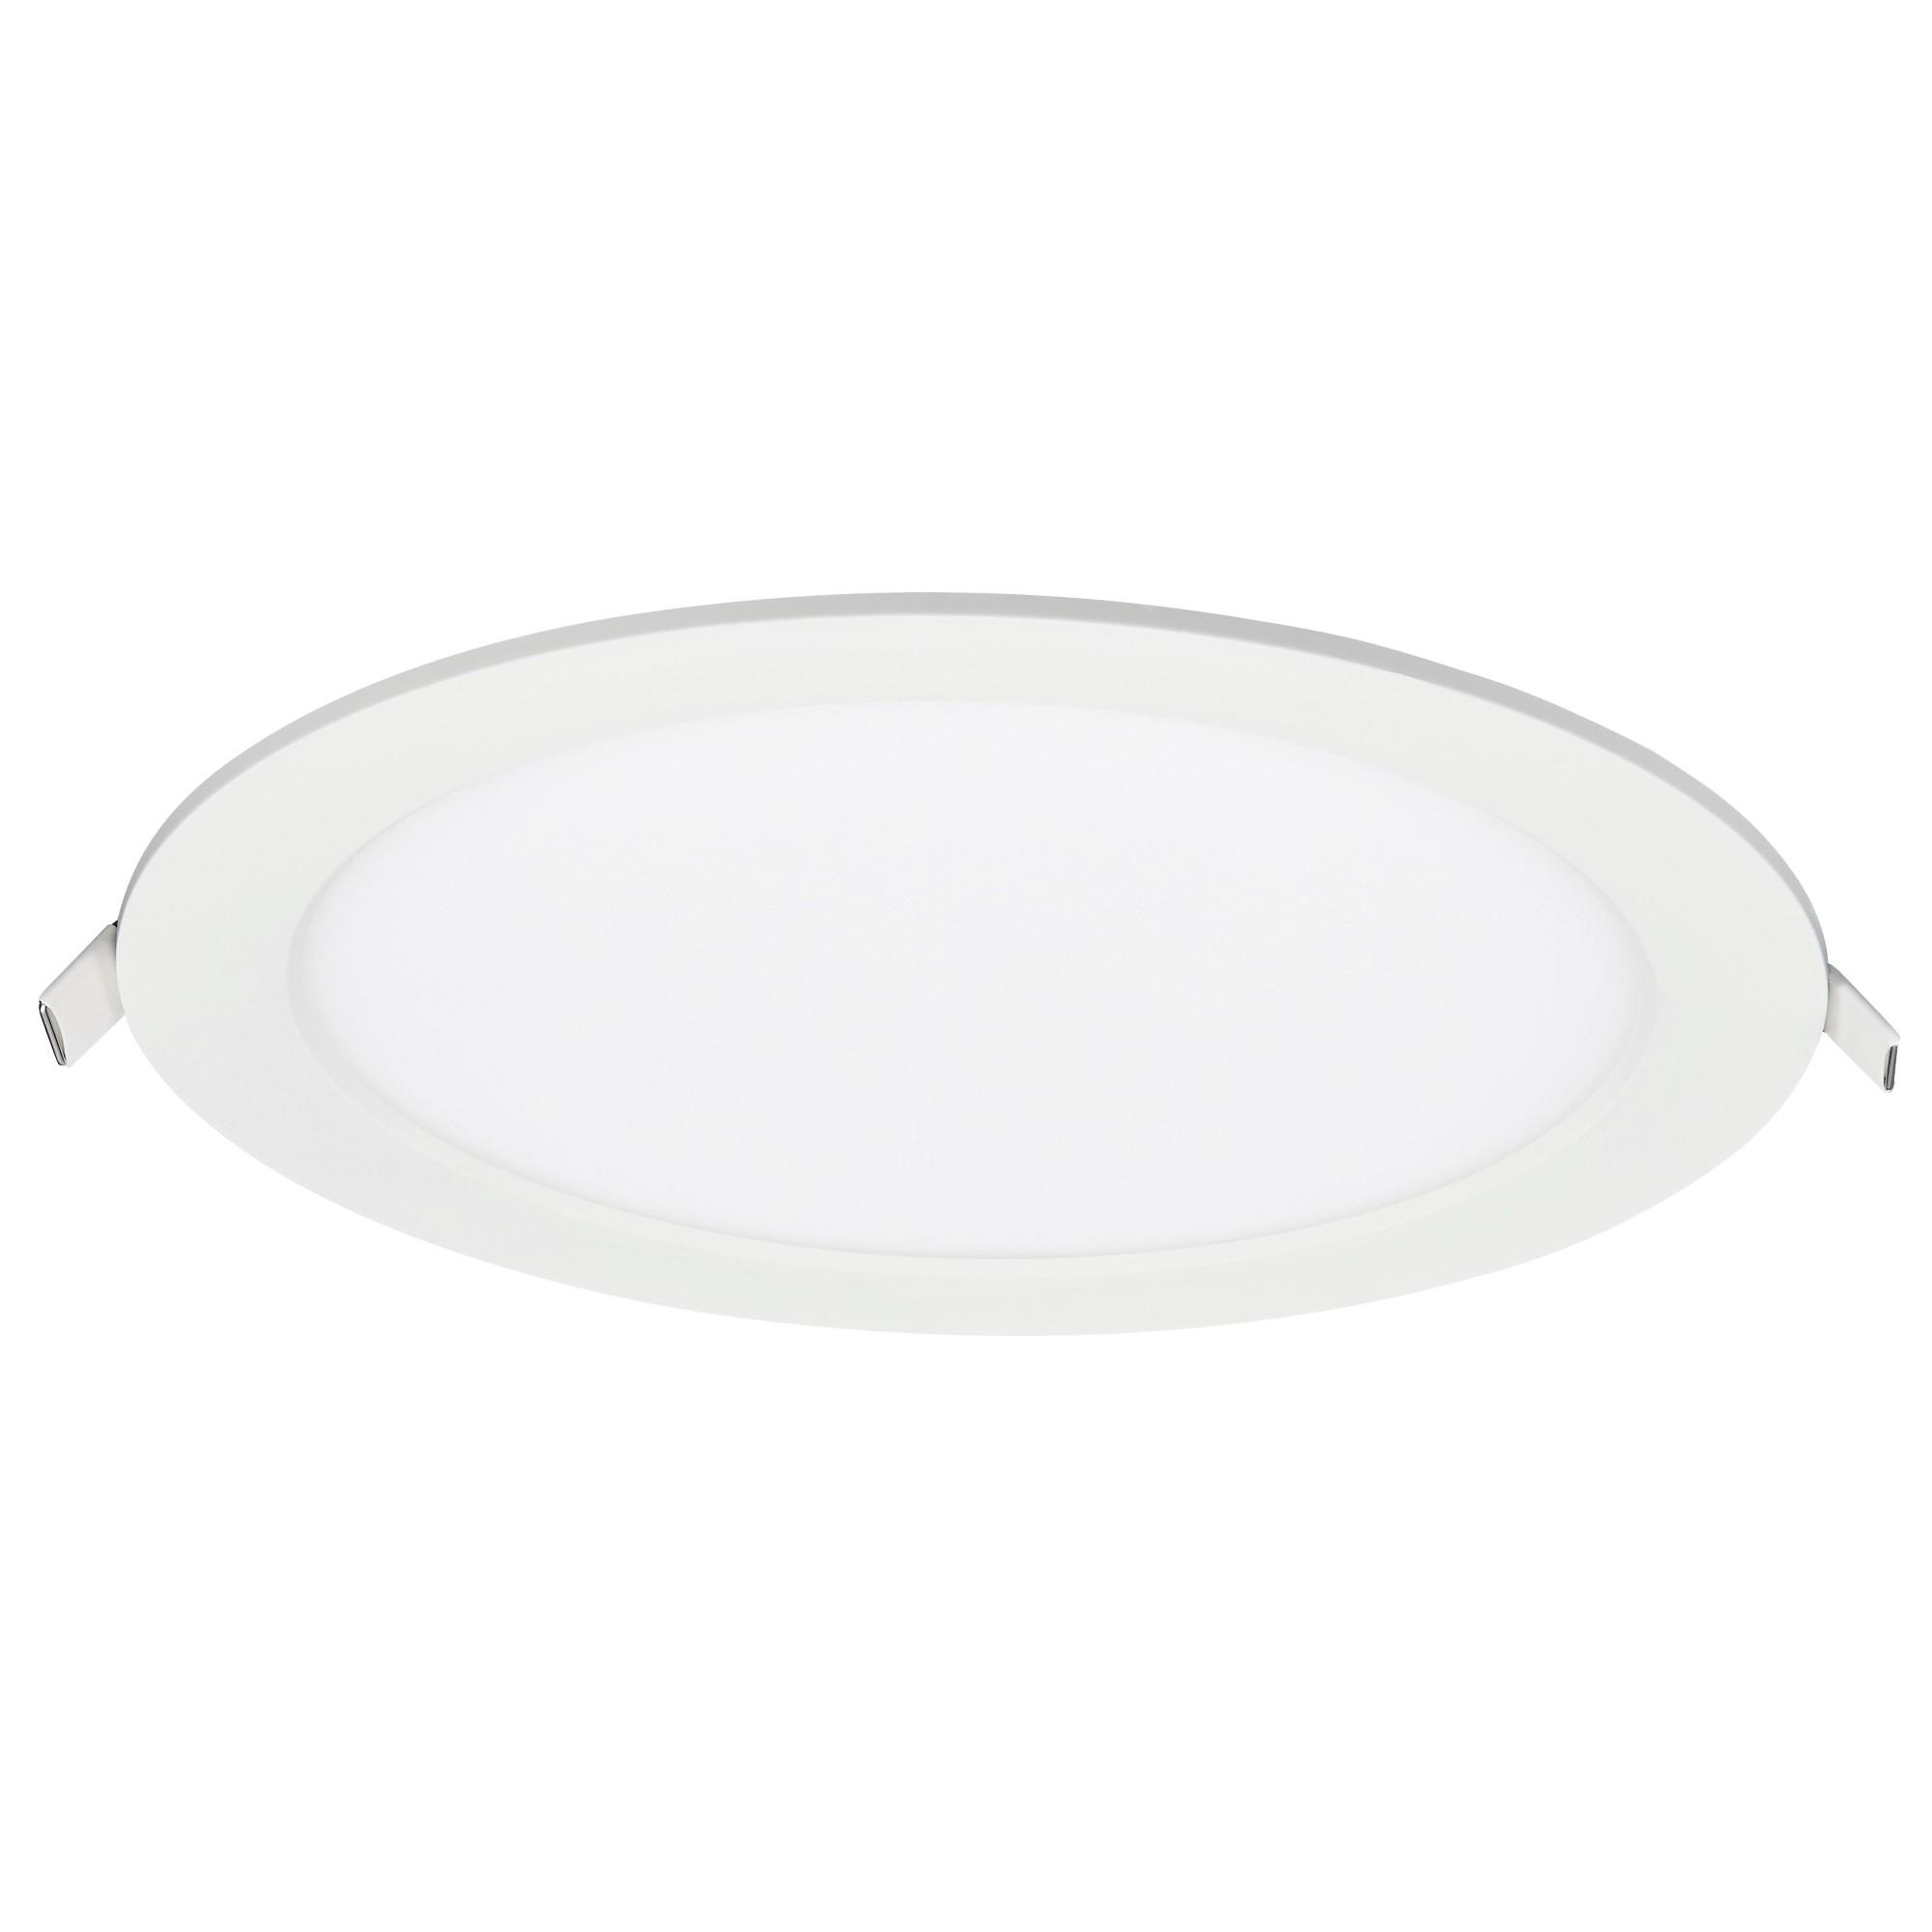 Painel LED Redondo de Embutir em Aluminio Luz Amarela 12W Bivolt - Ecoline